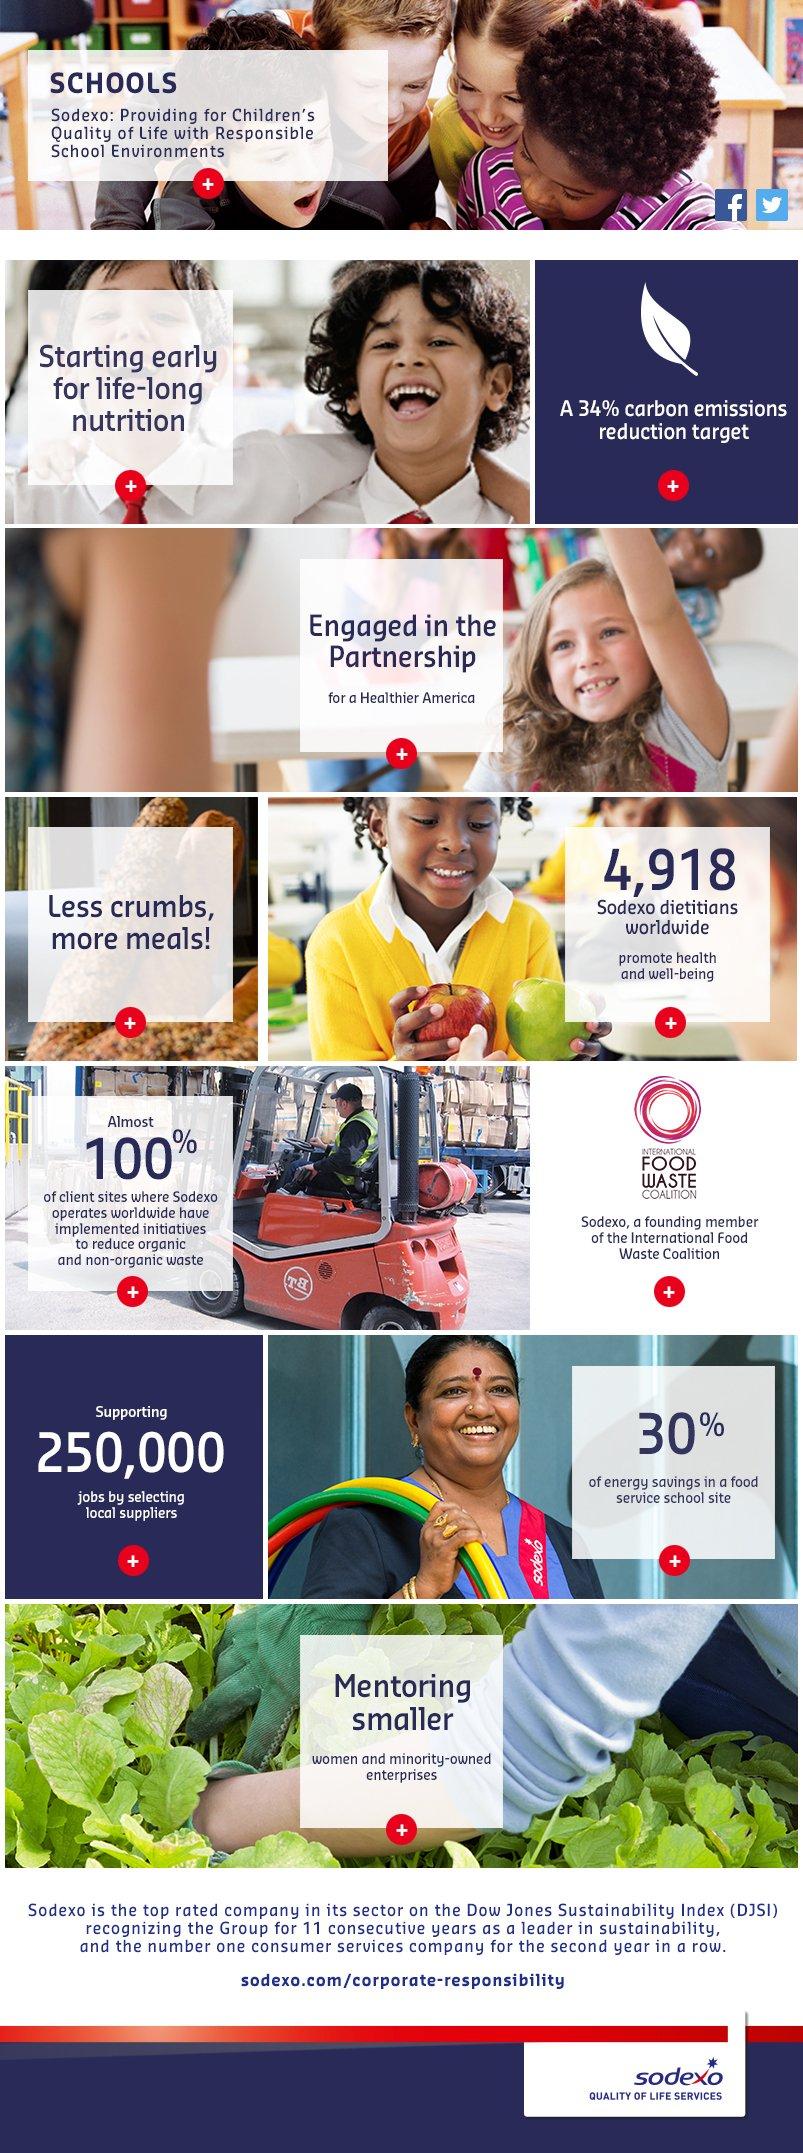 Sodexo: Responsible School Environments for Children